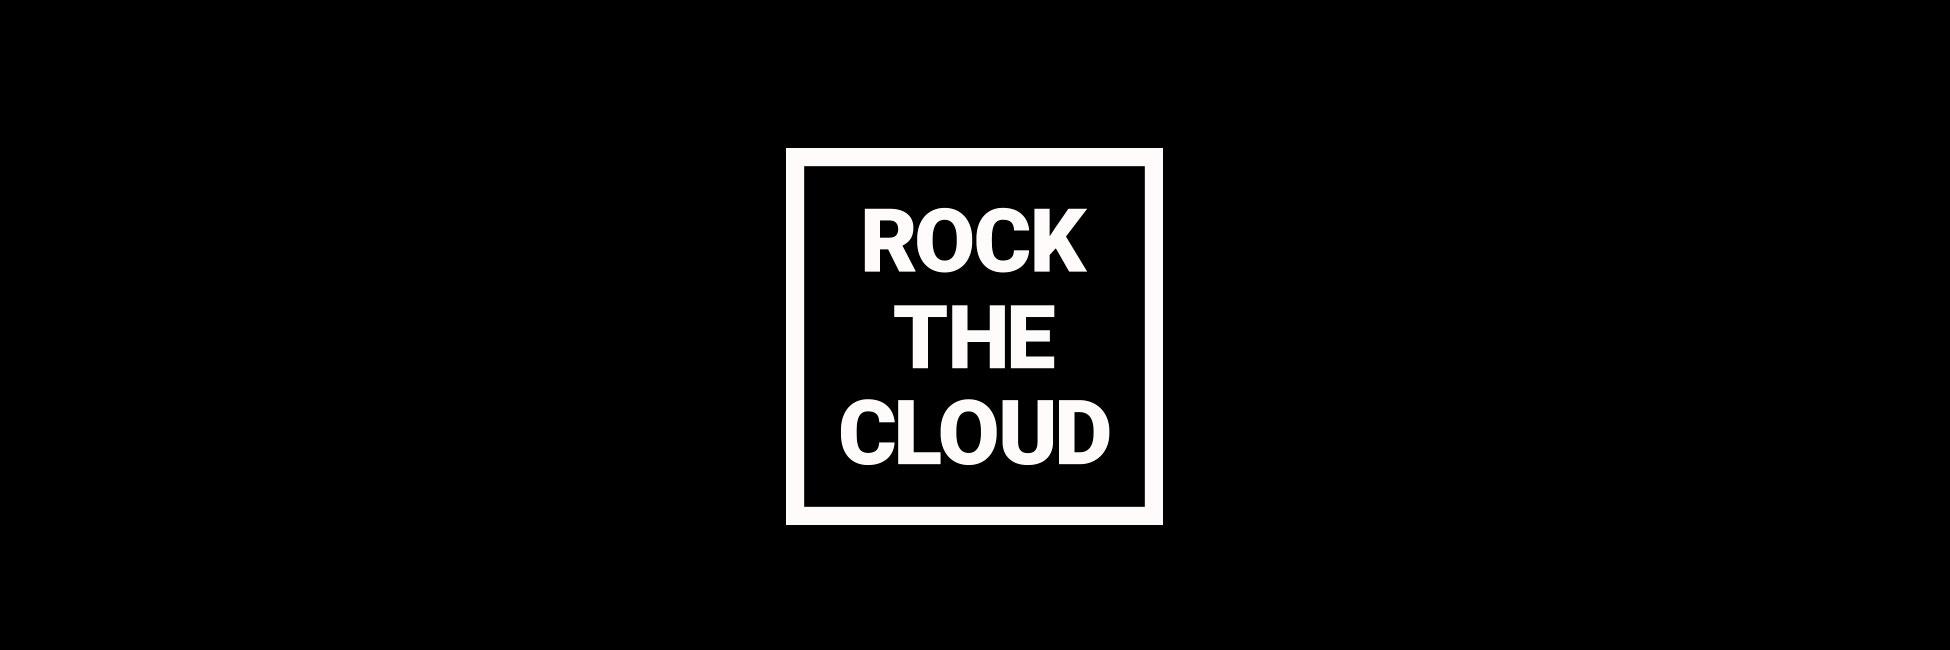 rock the cloud 2019